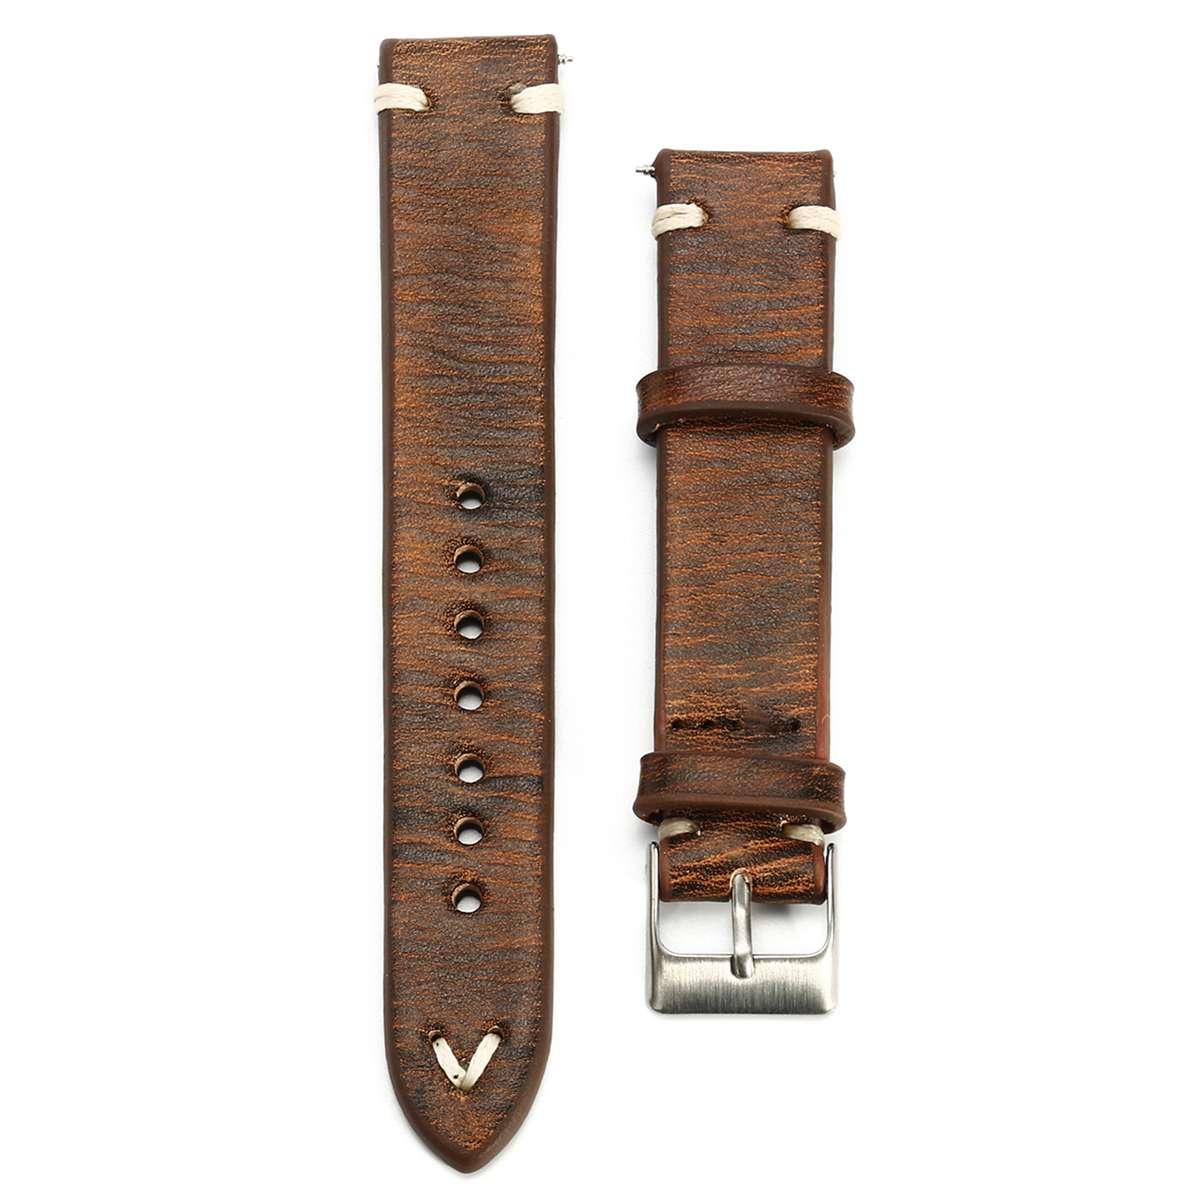 Fashion Vintage Genuine Leather Straps 18-24mm Watch Accessories Wrist Strap For Watches Pin Buckle Watchband Men Women Watch